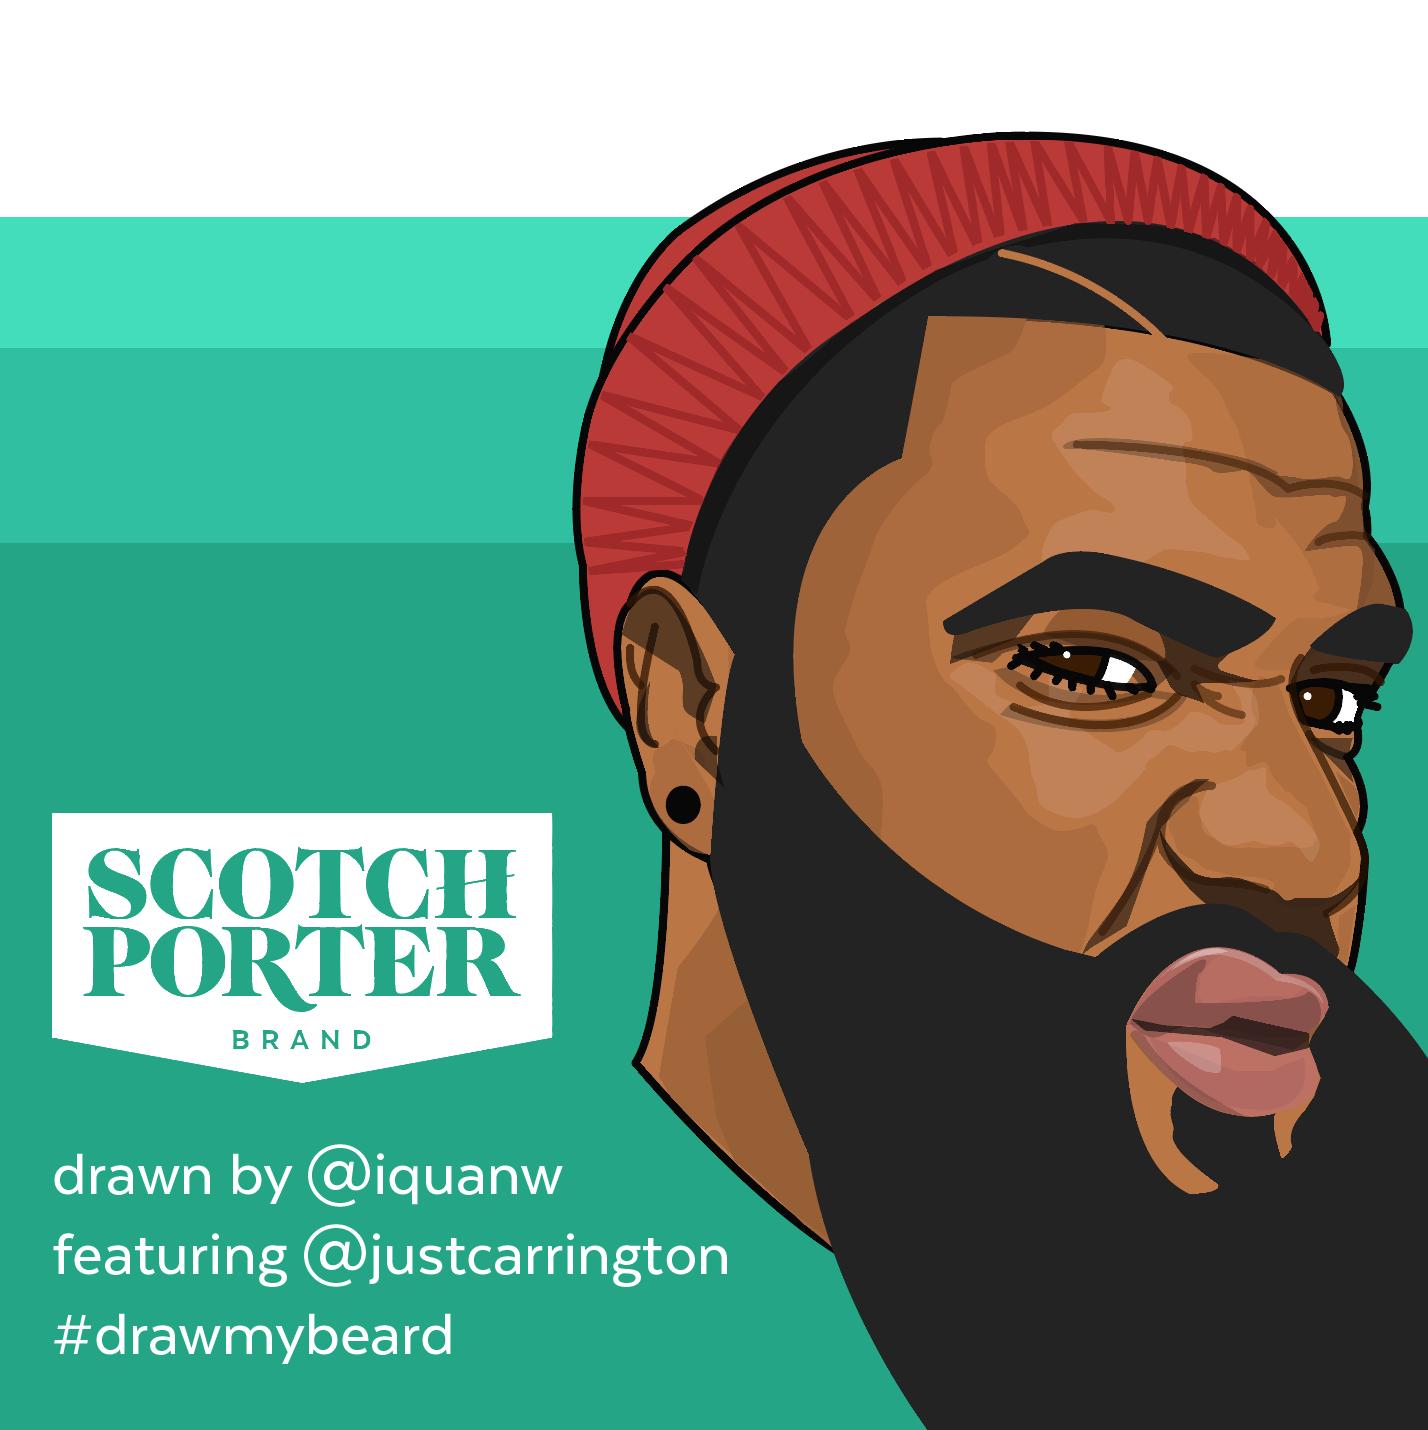 Draw my Beard: 001 JustCarrington